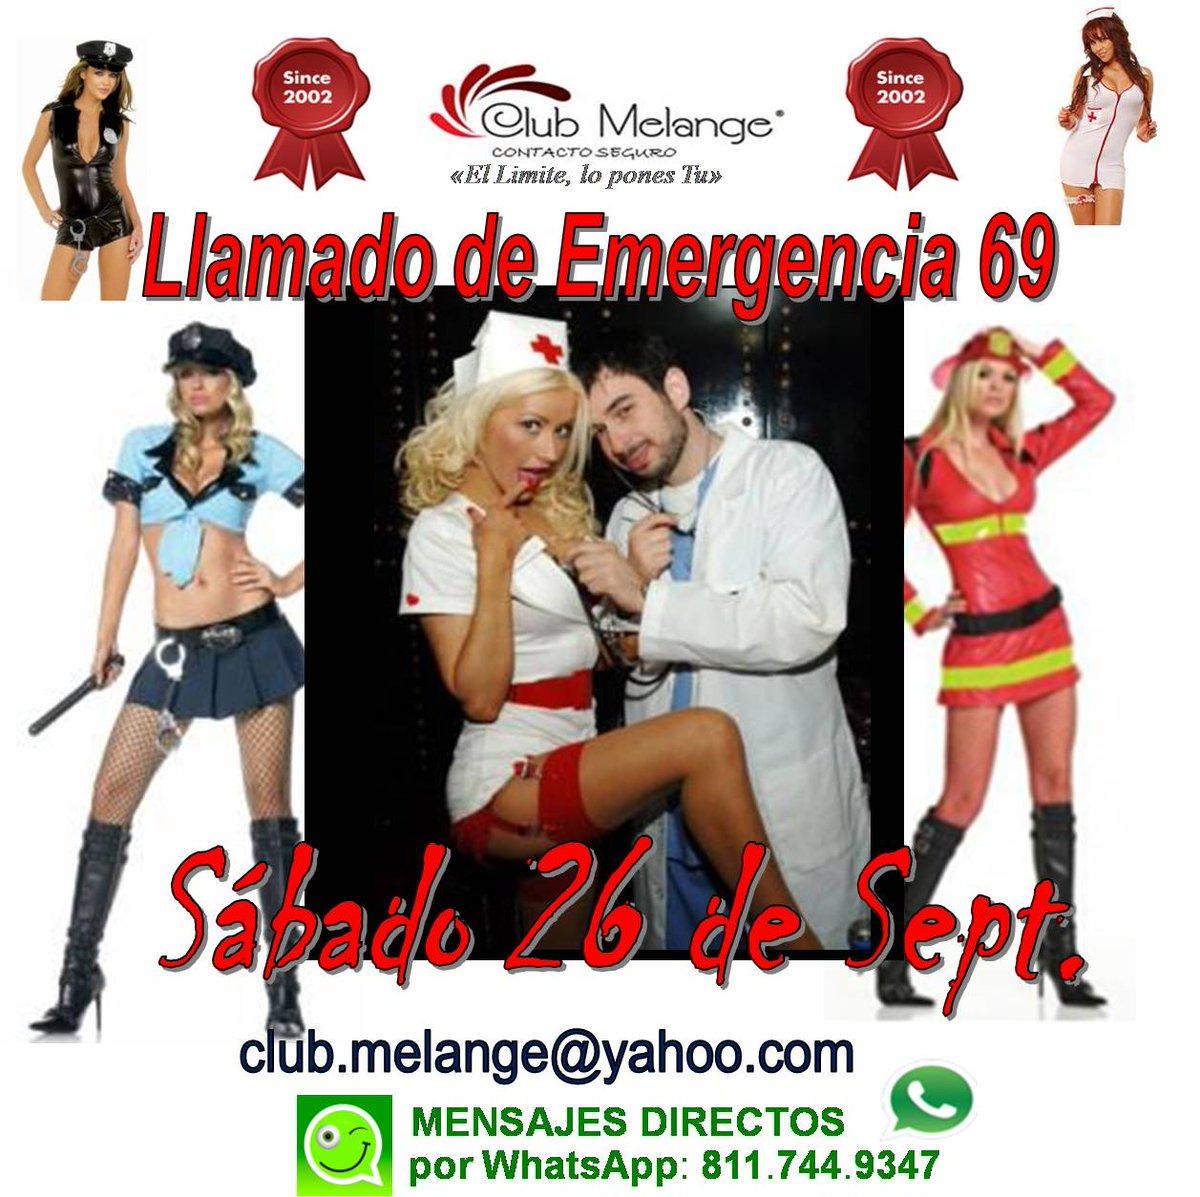 Club Melange (@ClubMelange): http://t.co/CJyl5yI8P4